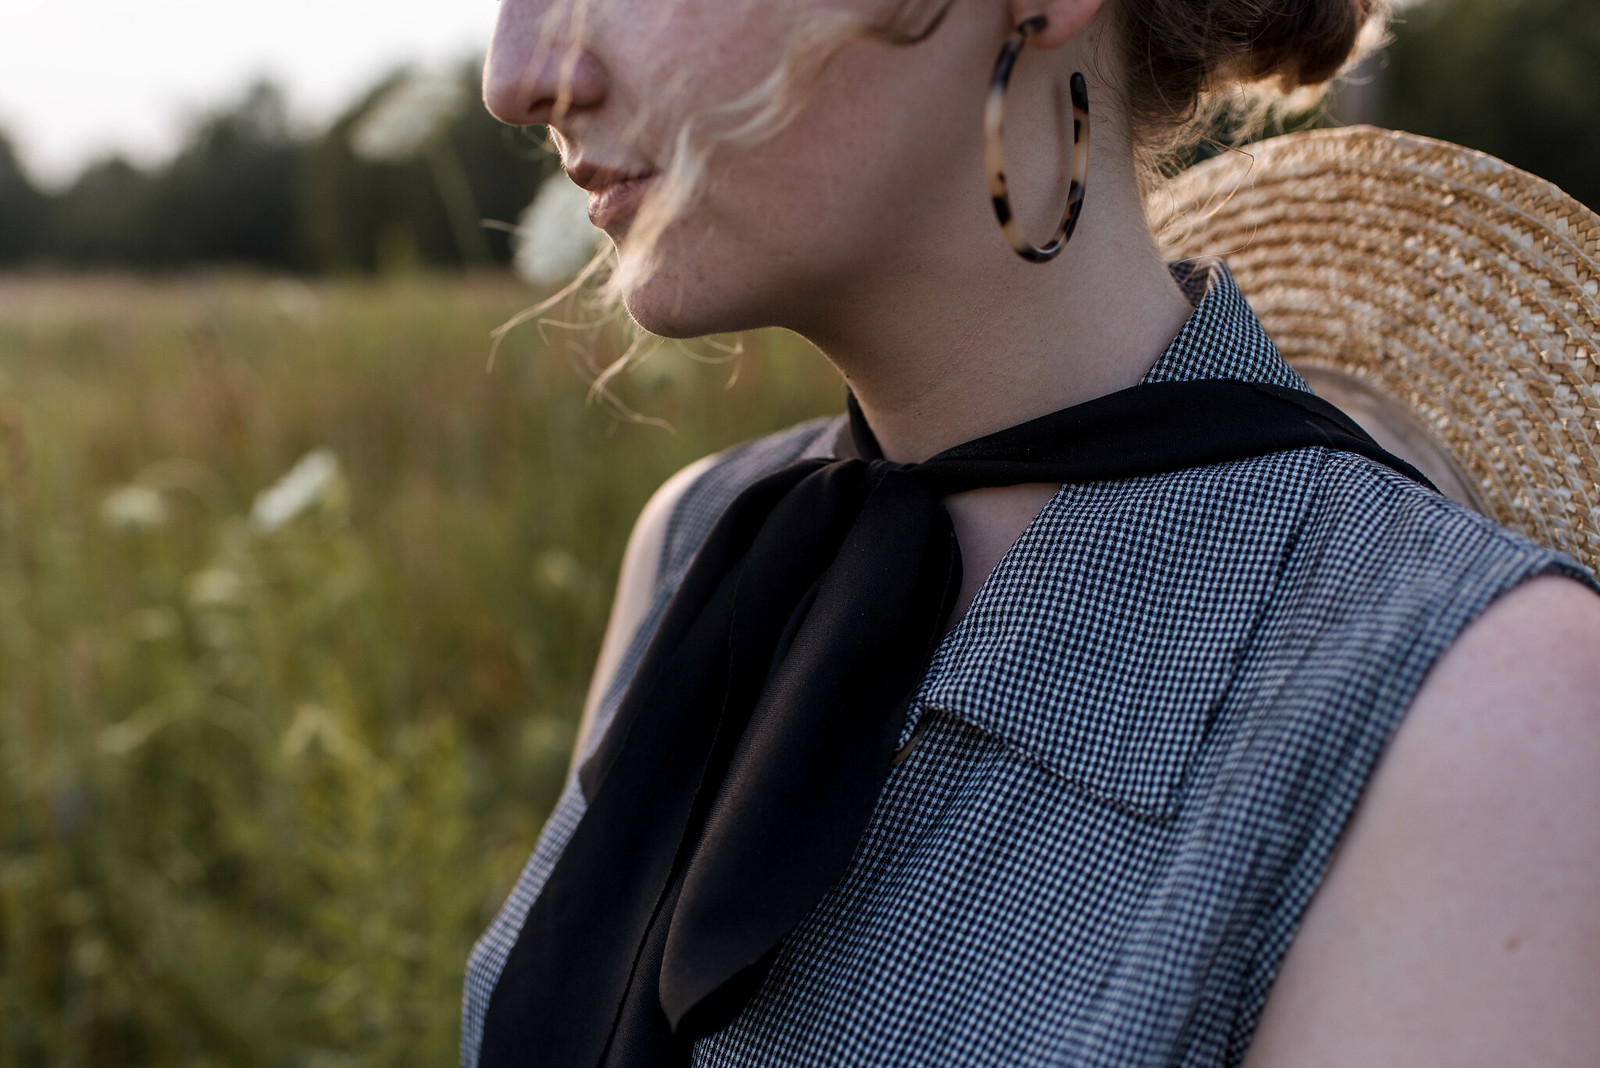 Machete Hoops and Ethical Dress on juliettelaura.blogspot.com